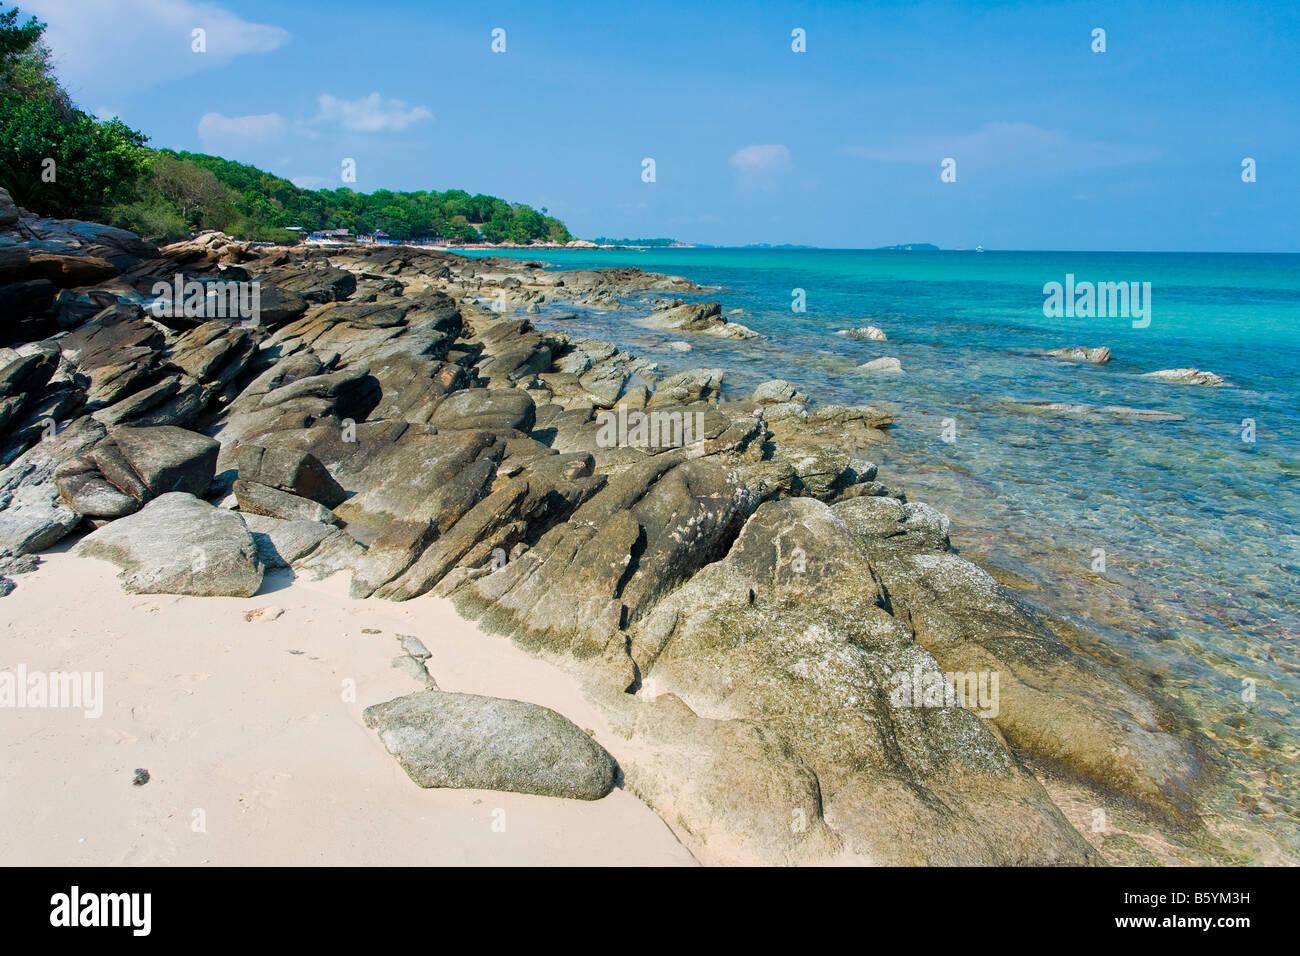 Koh Chang Asia Thailand beach natur stone - Stock Image